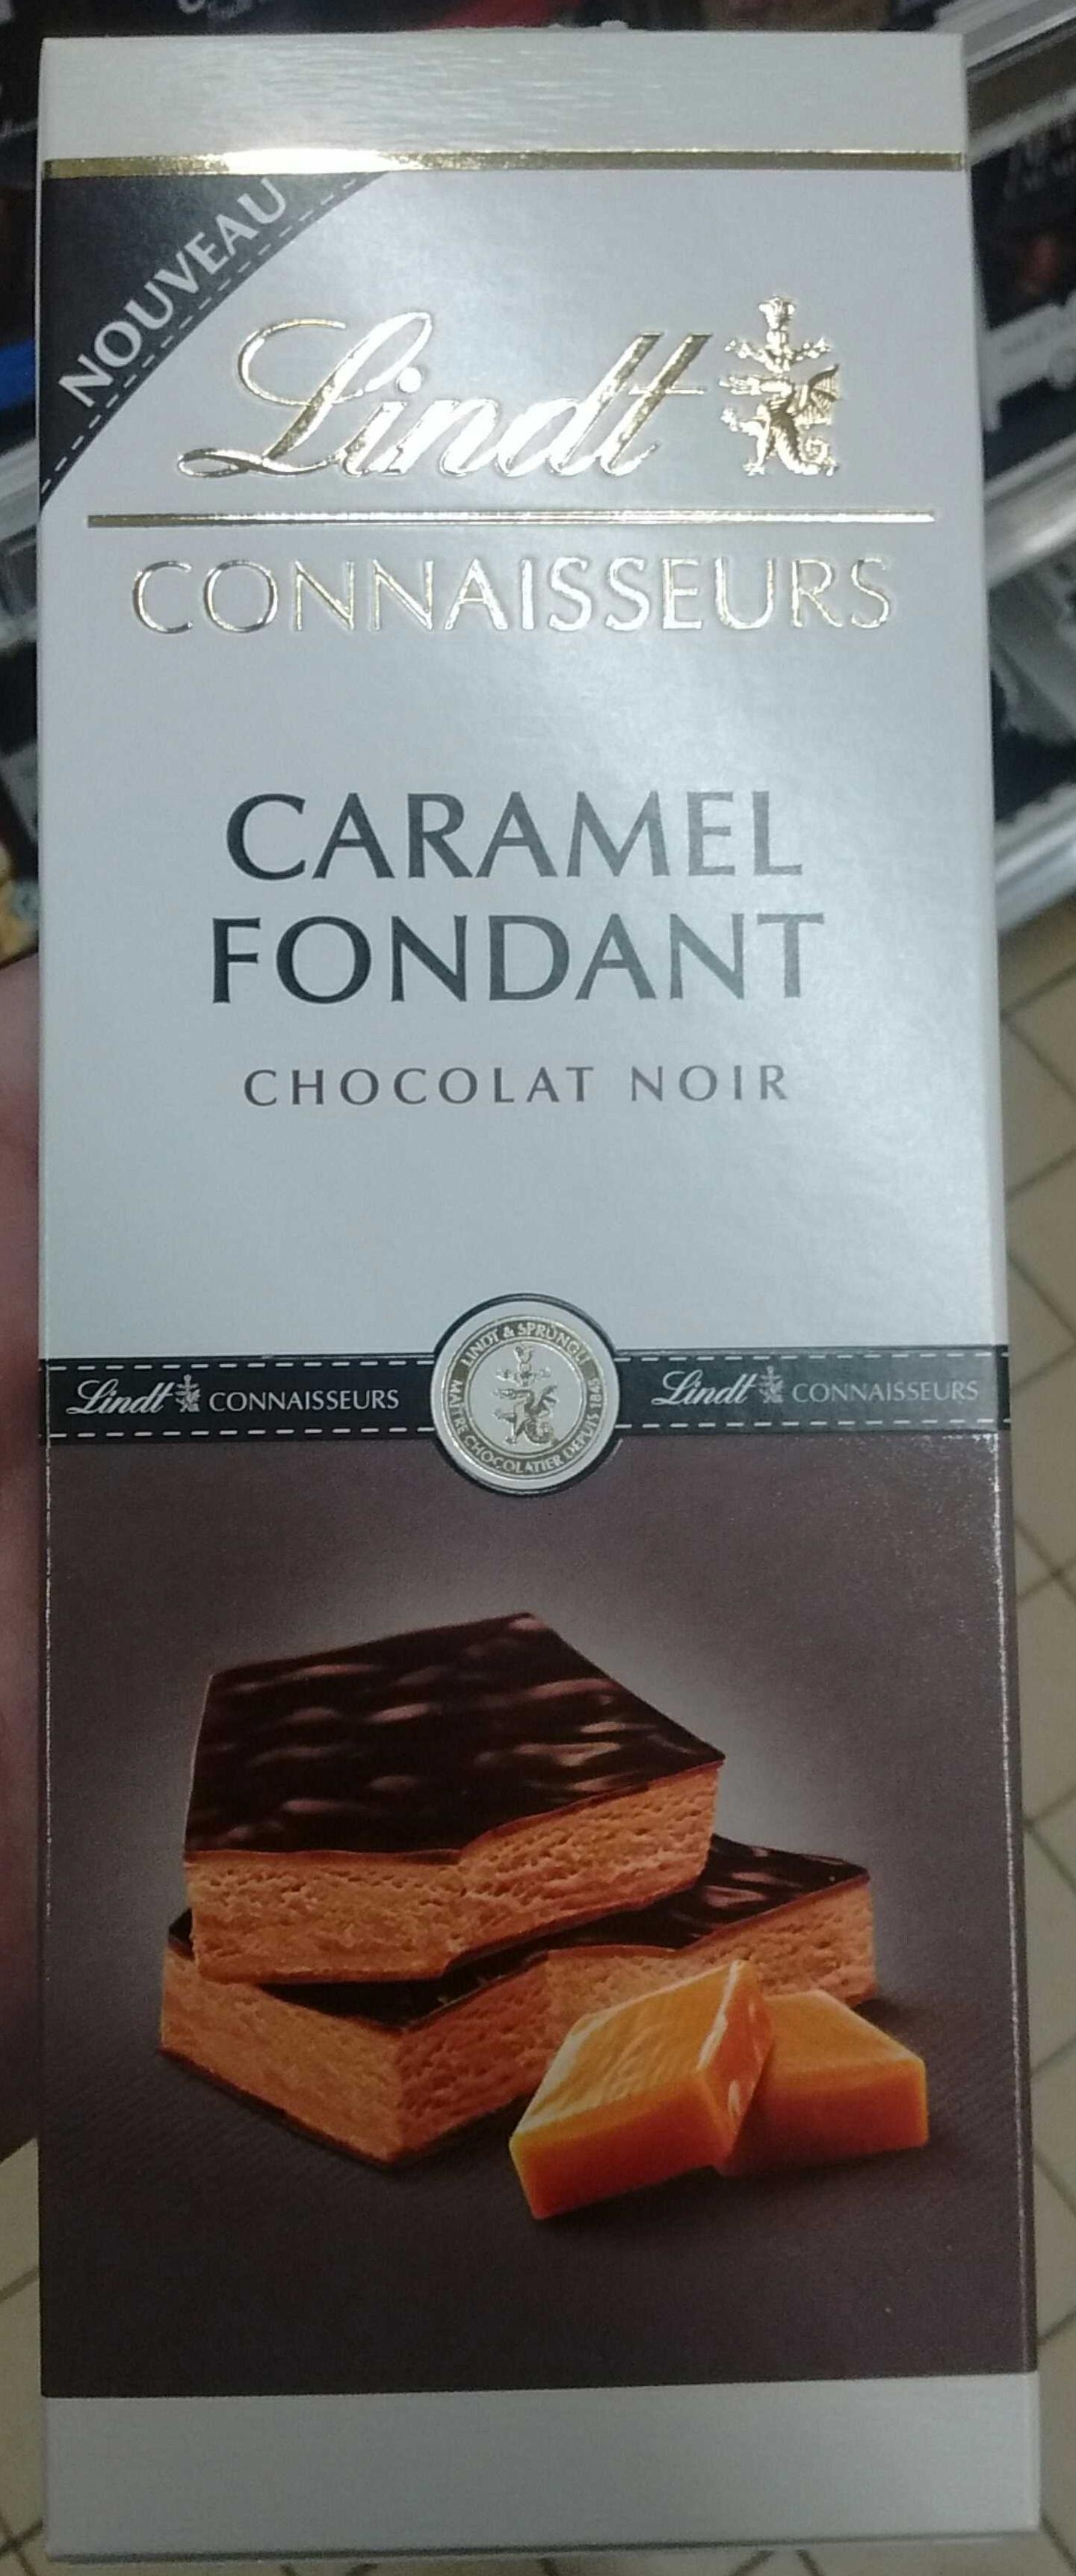 Connaisseurs Caramel Fondant Chocolat Noir - Product